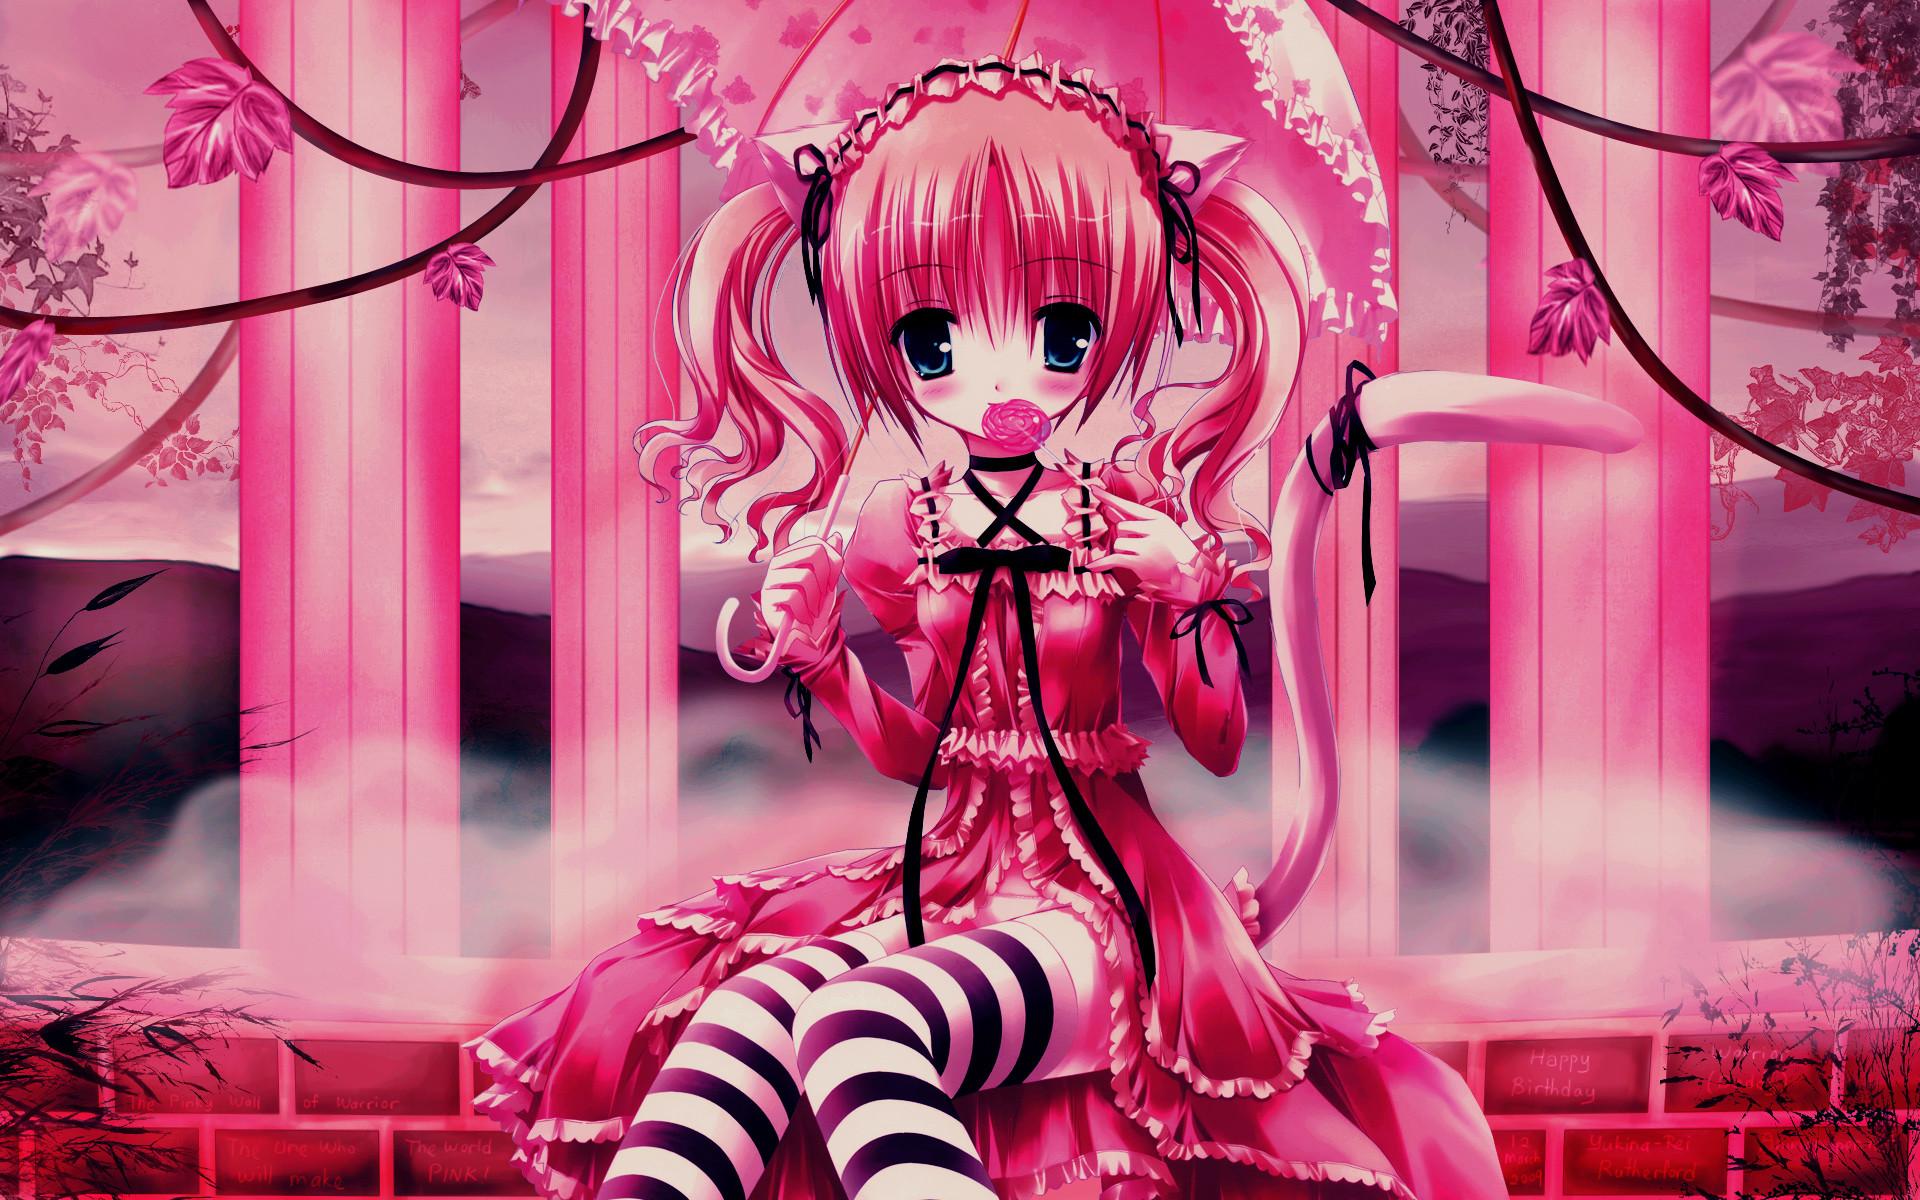 Anime cat girl wallpaper 72 images 2483x1552 cat girl nekomimi art girl superb anime wallpapers hd voltagebd Choice Image